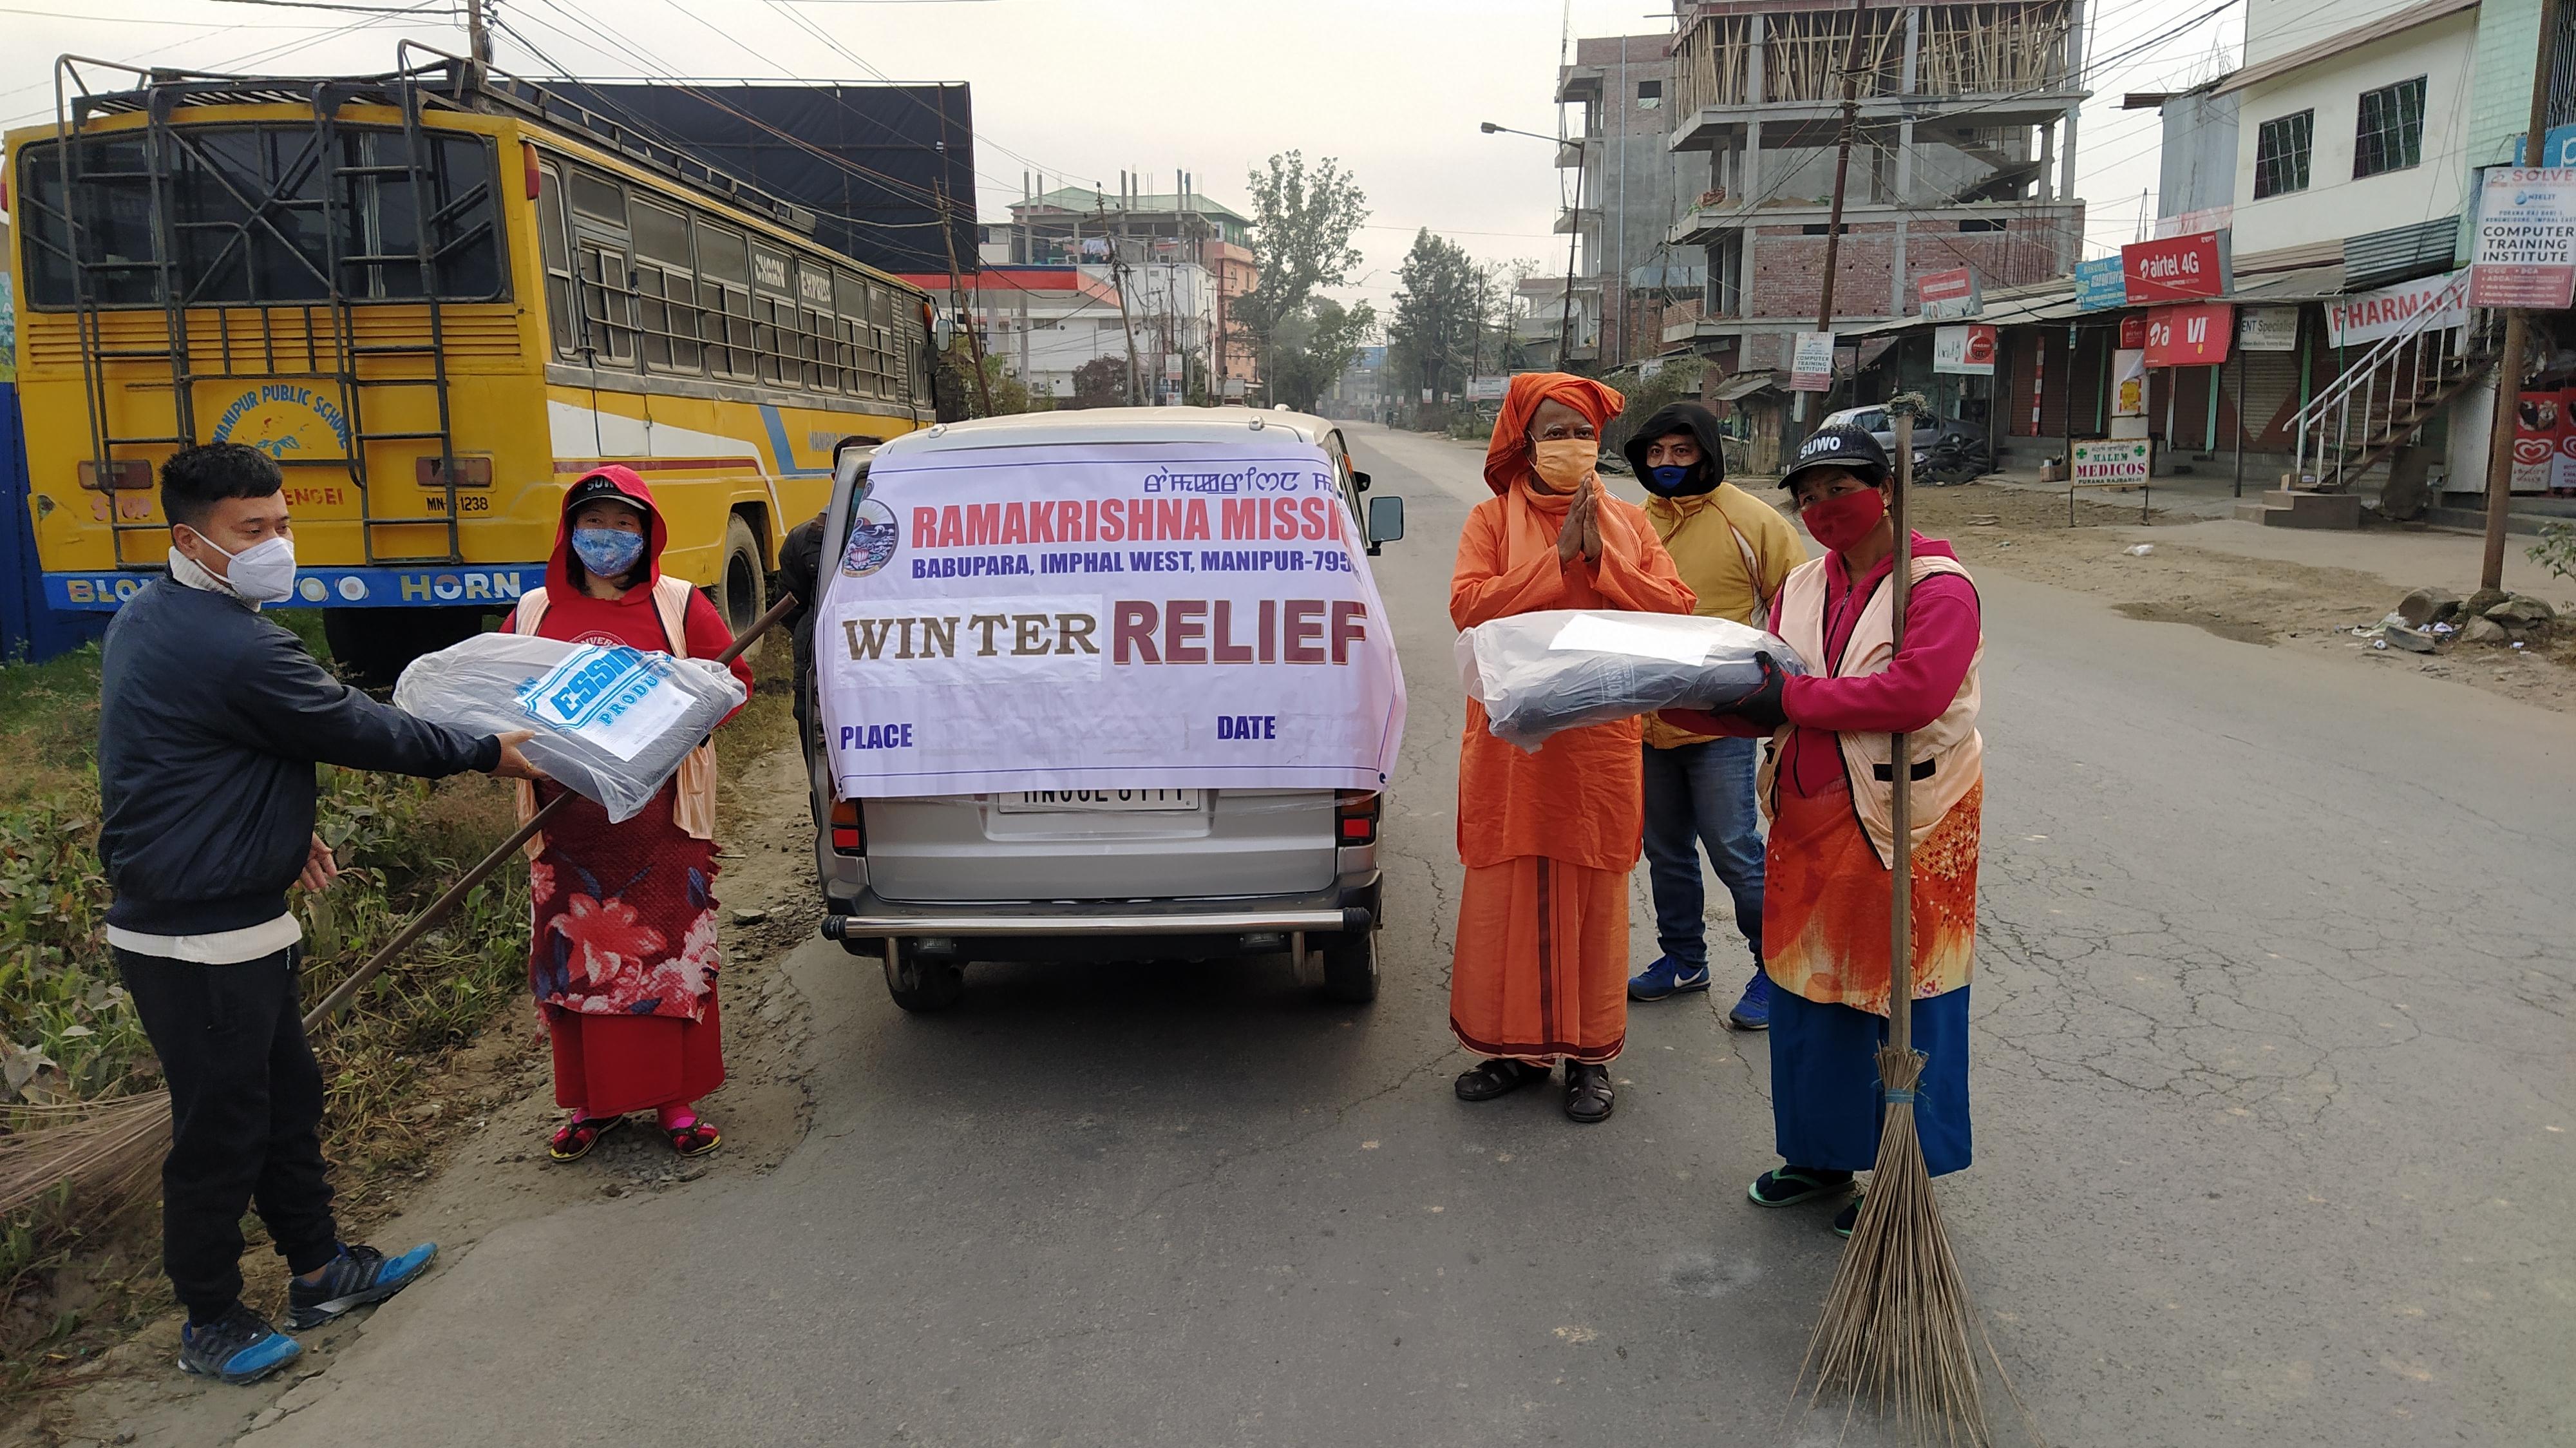 Winter Relief Sanitation 26.11.2020 (9)